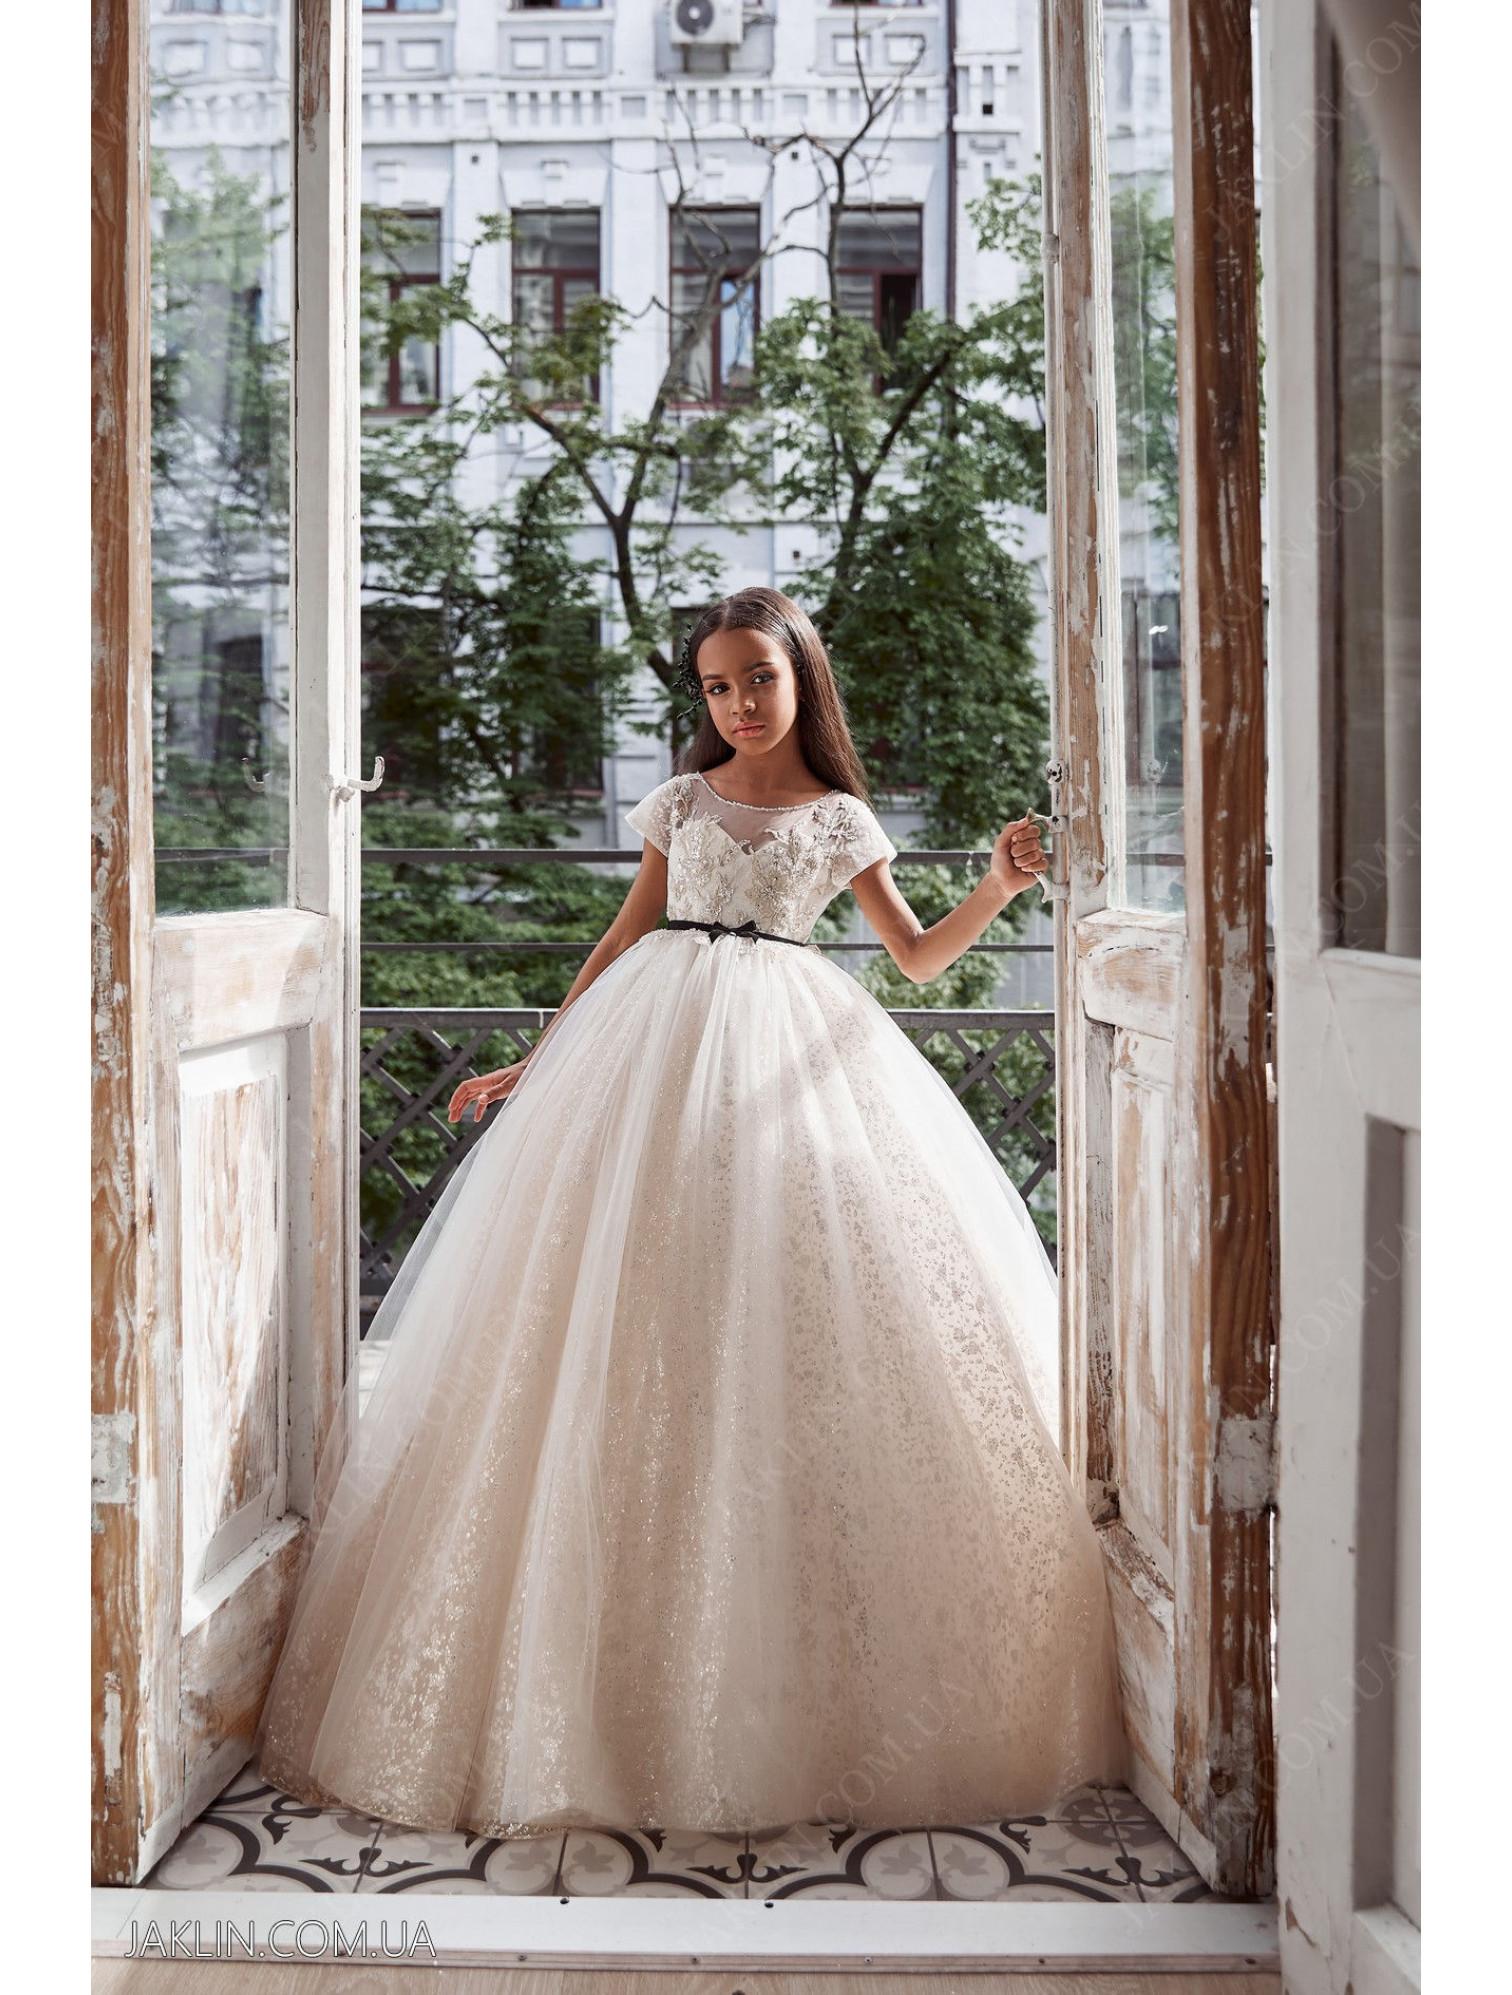 Child dress 3125